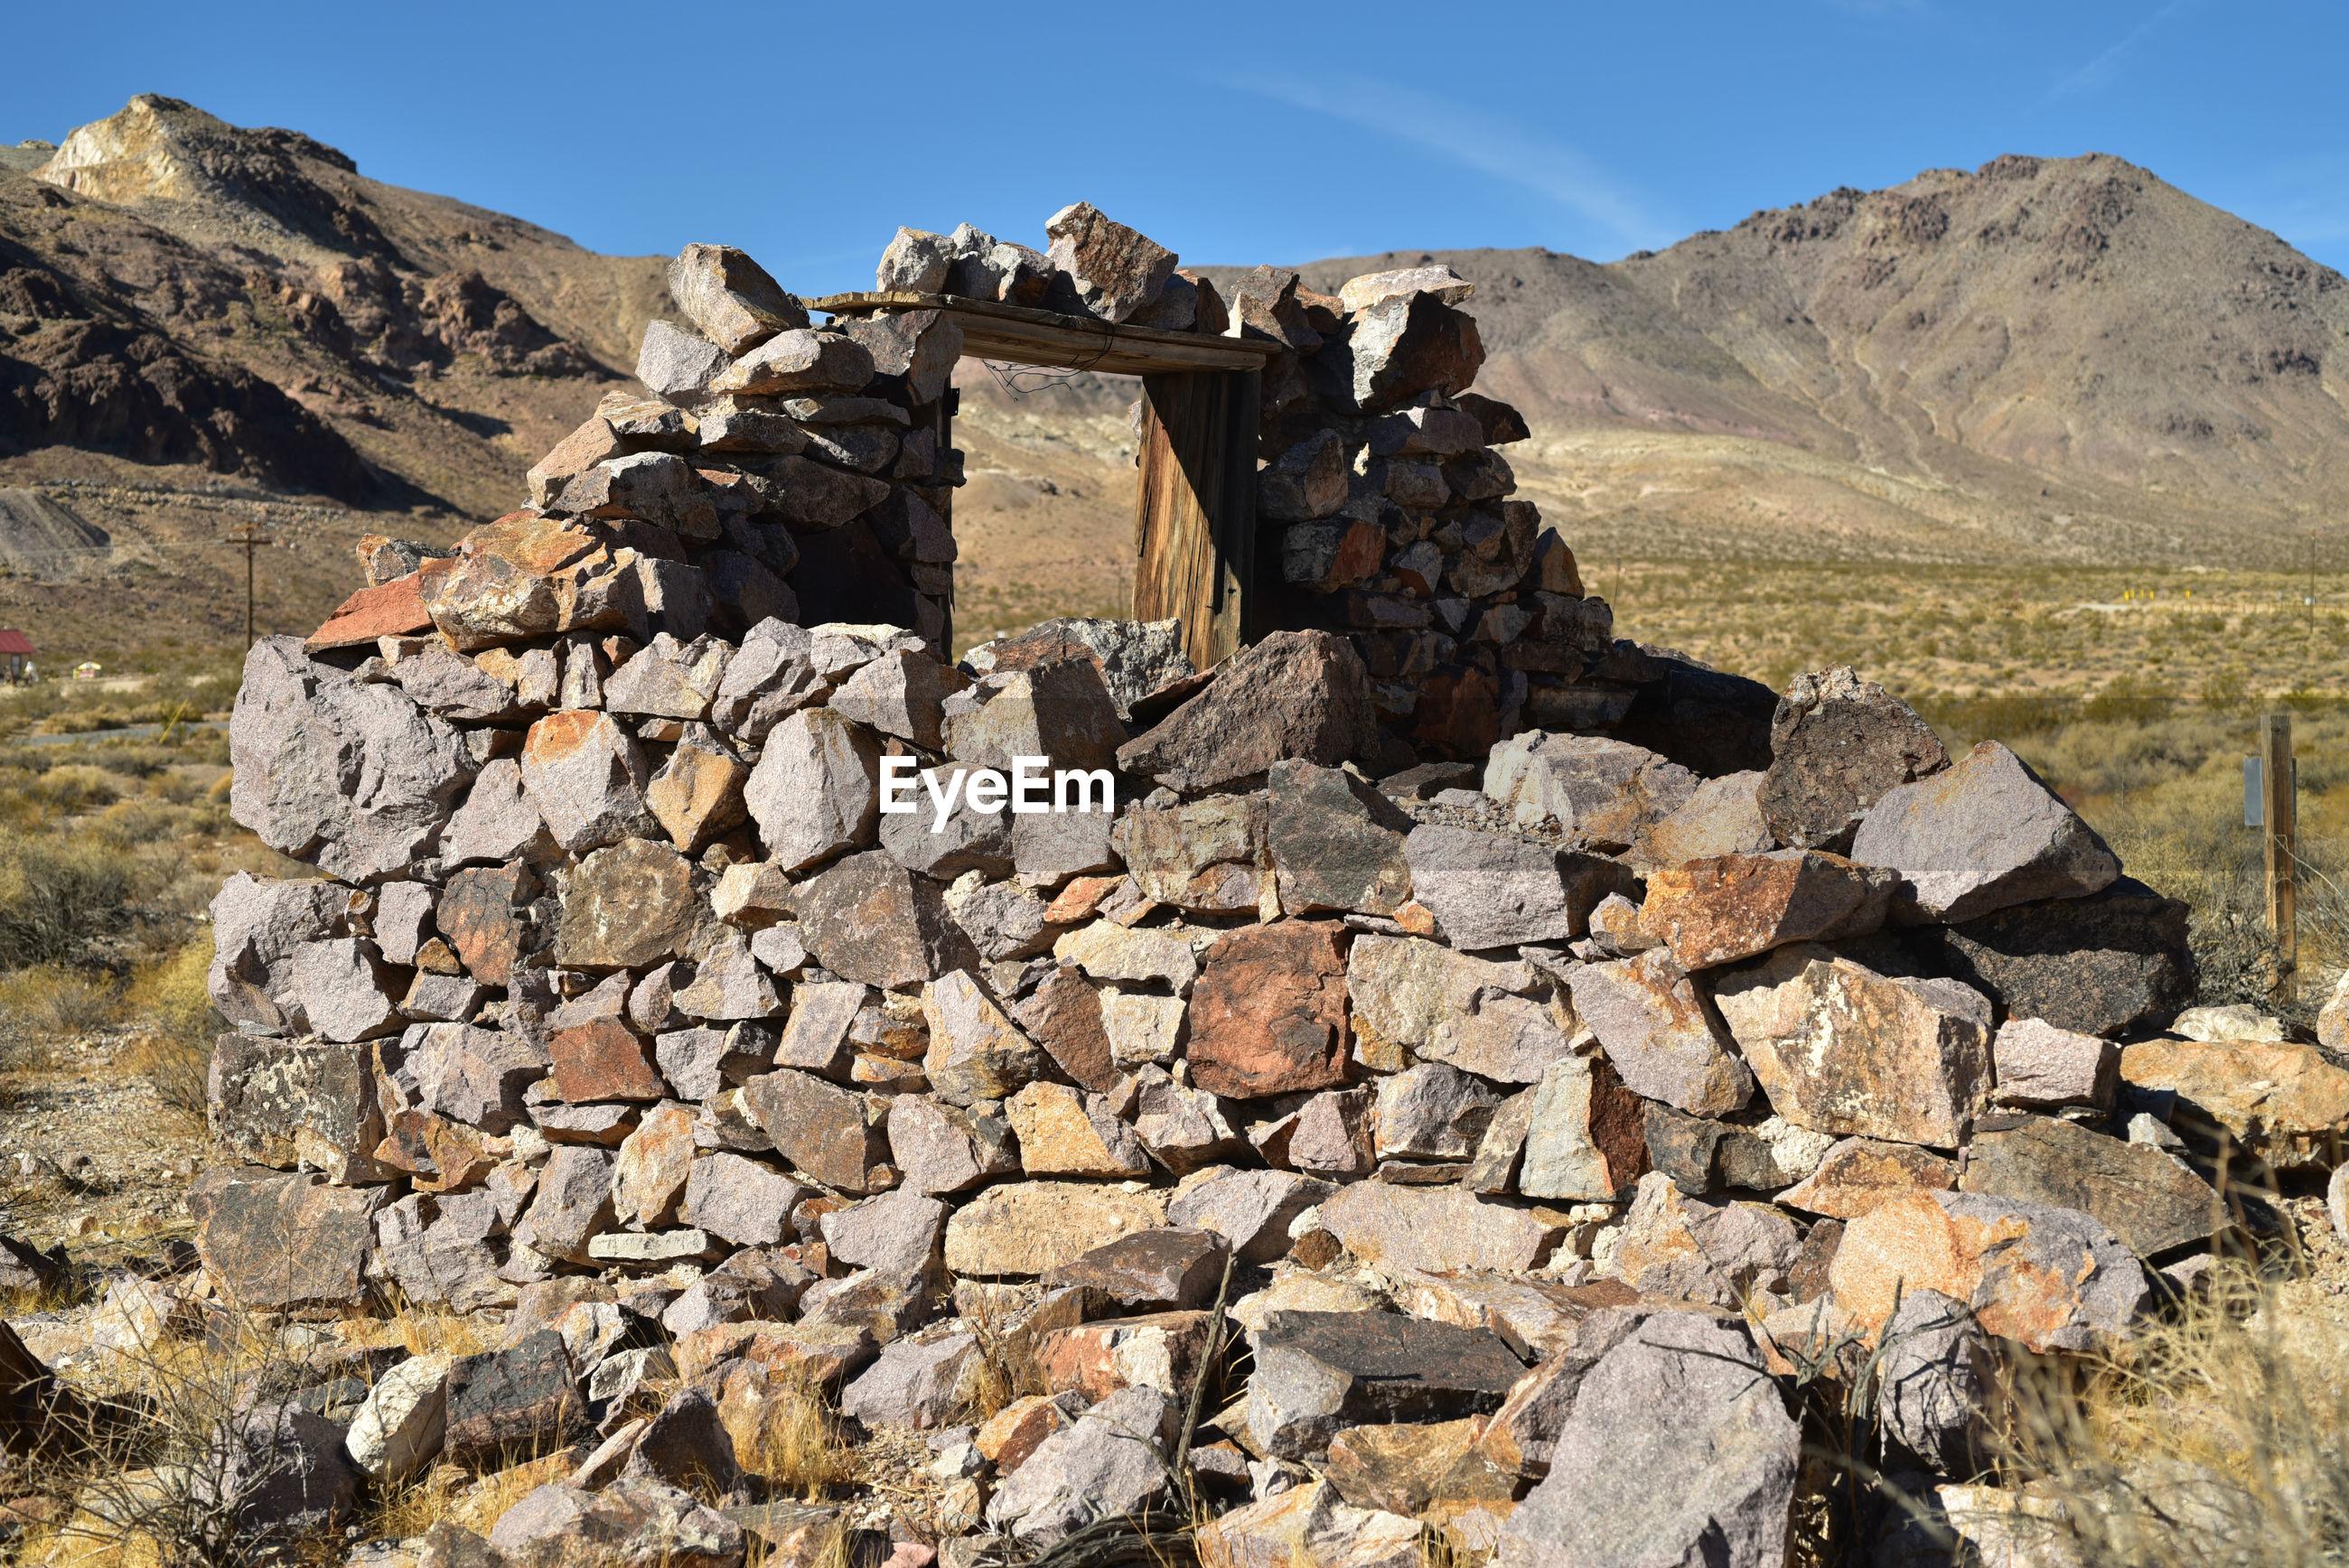 STONE WALL AGAINST MOUNTAIN RANGE